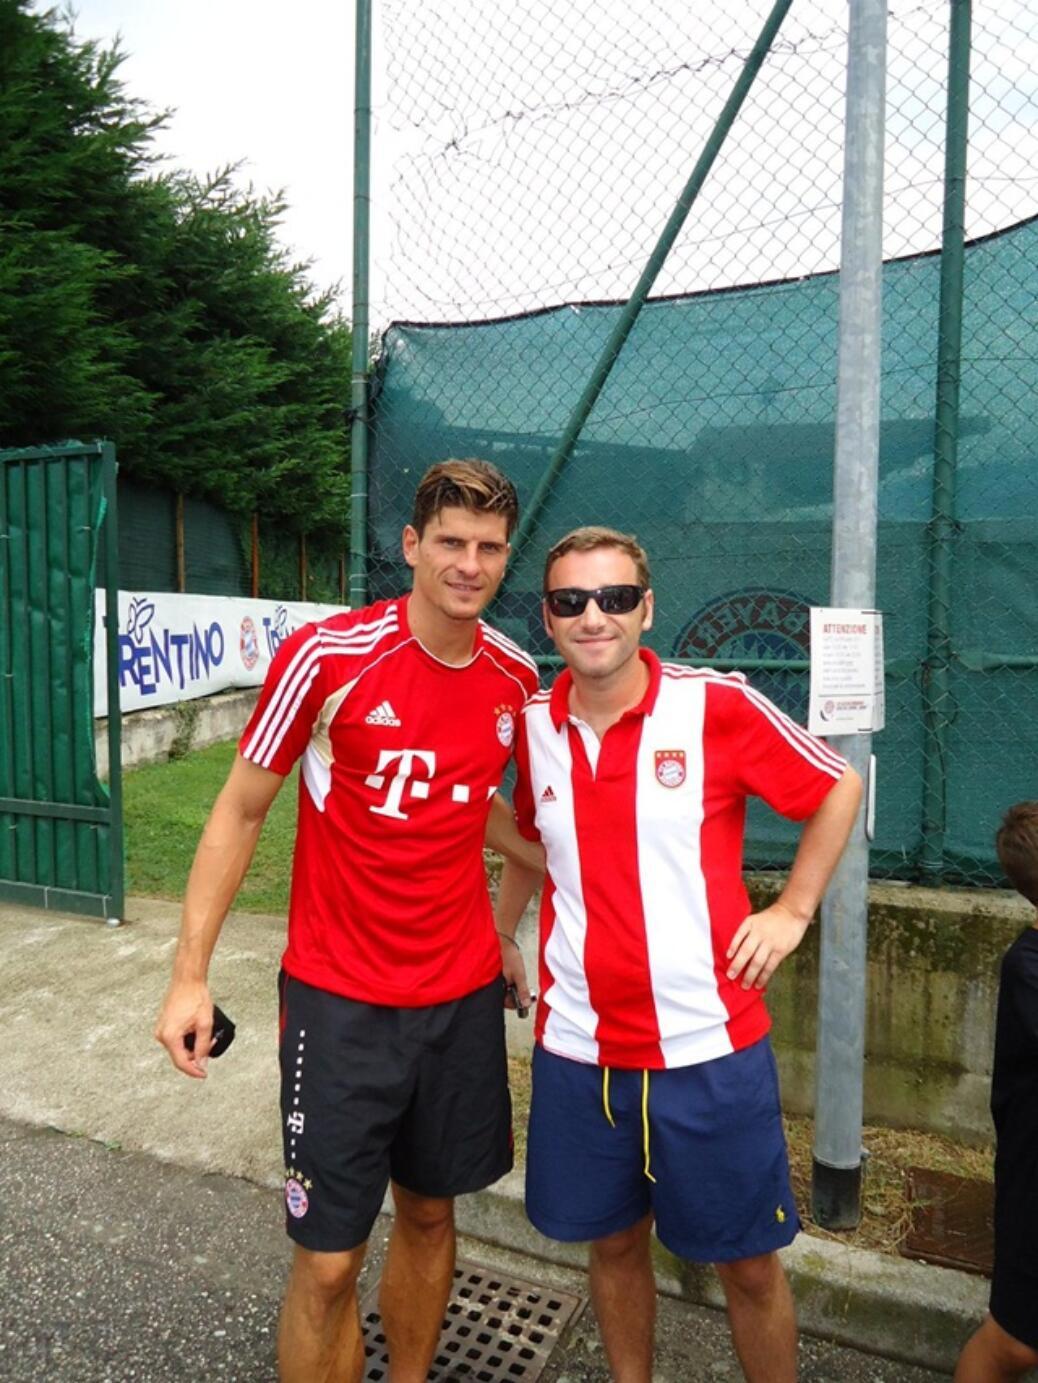 Flo und David im Trainingslager des FCB